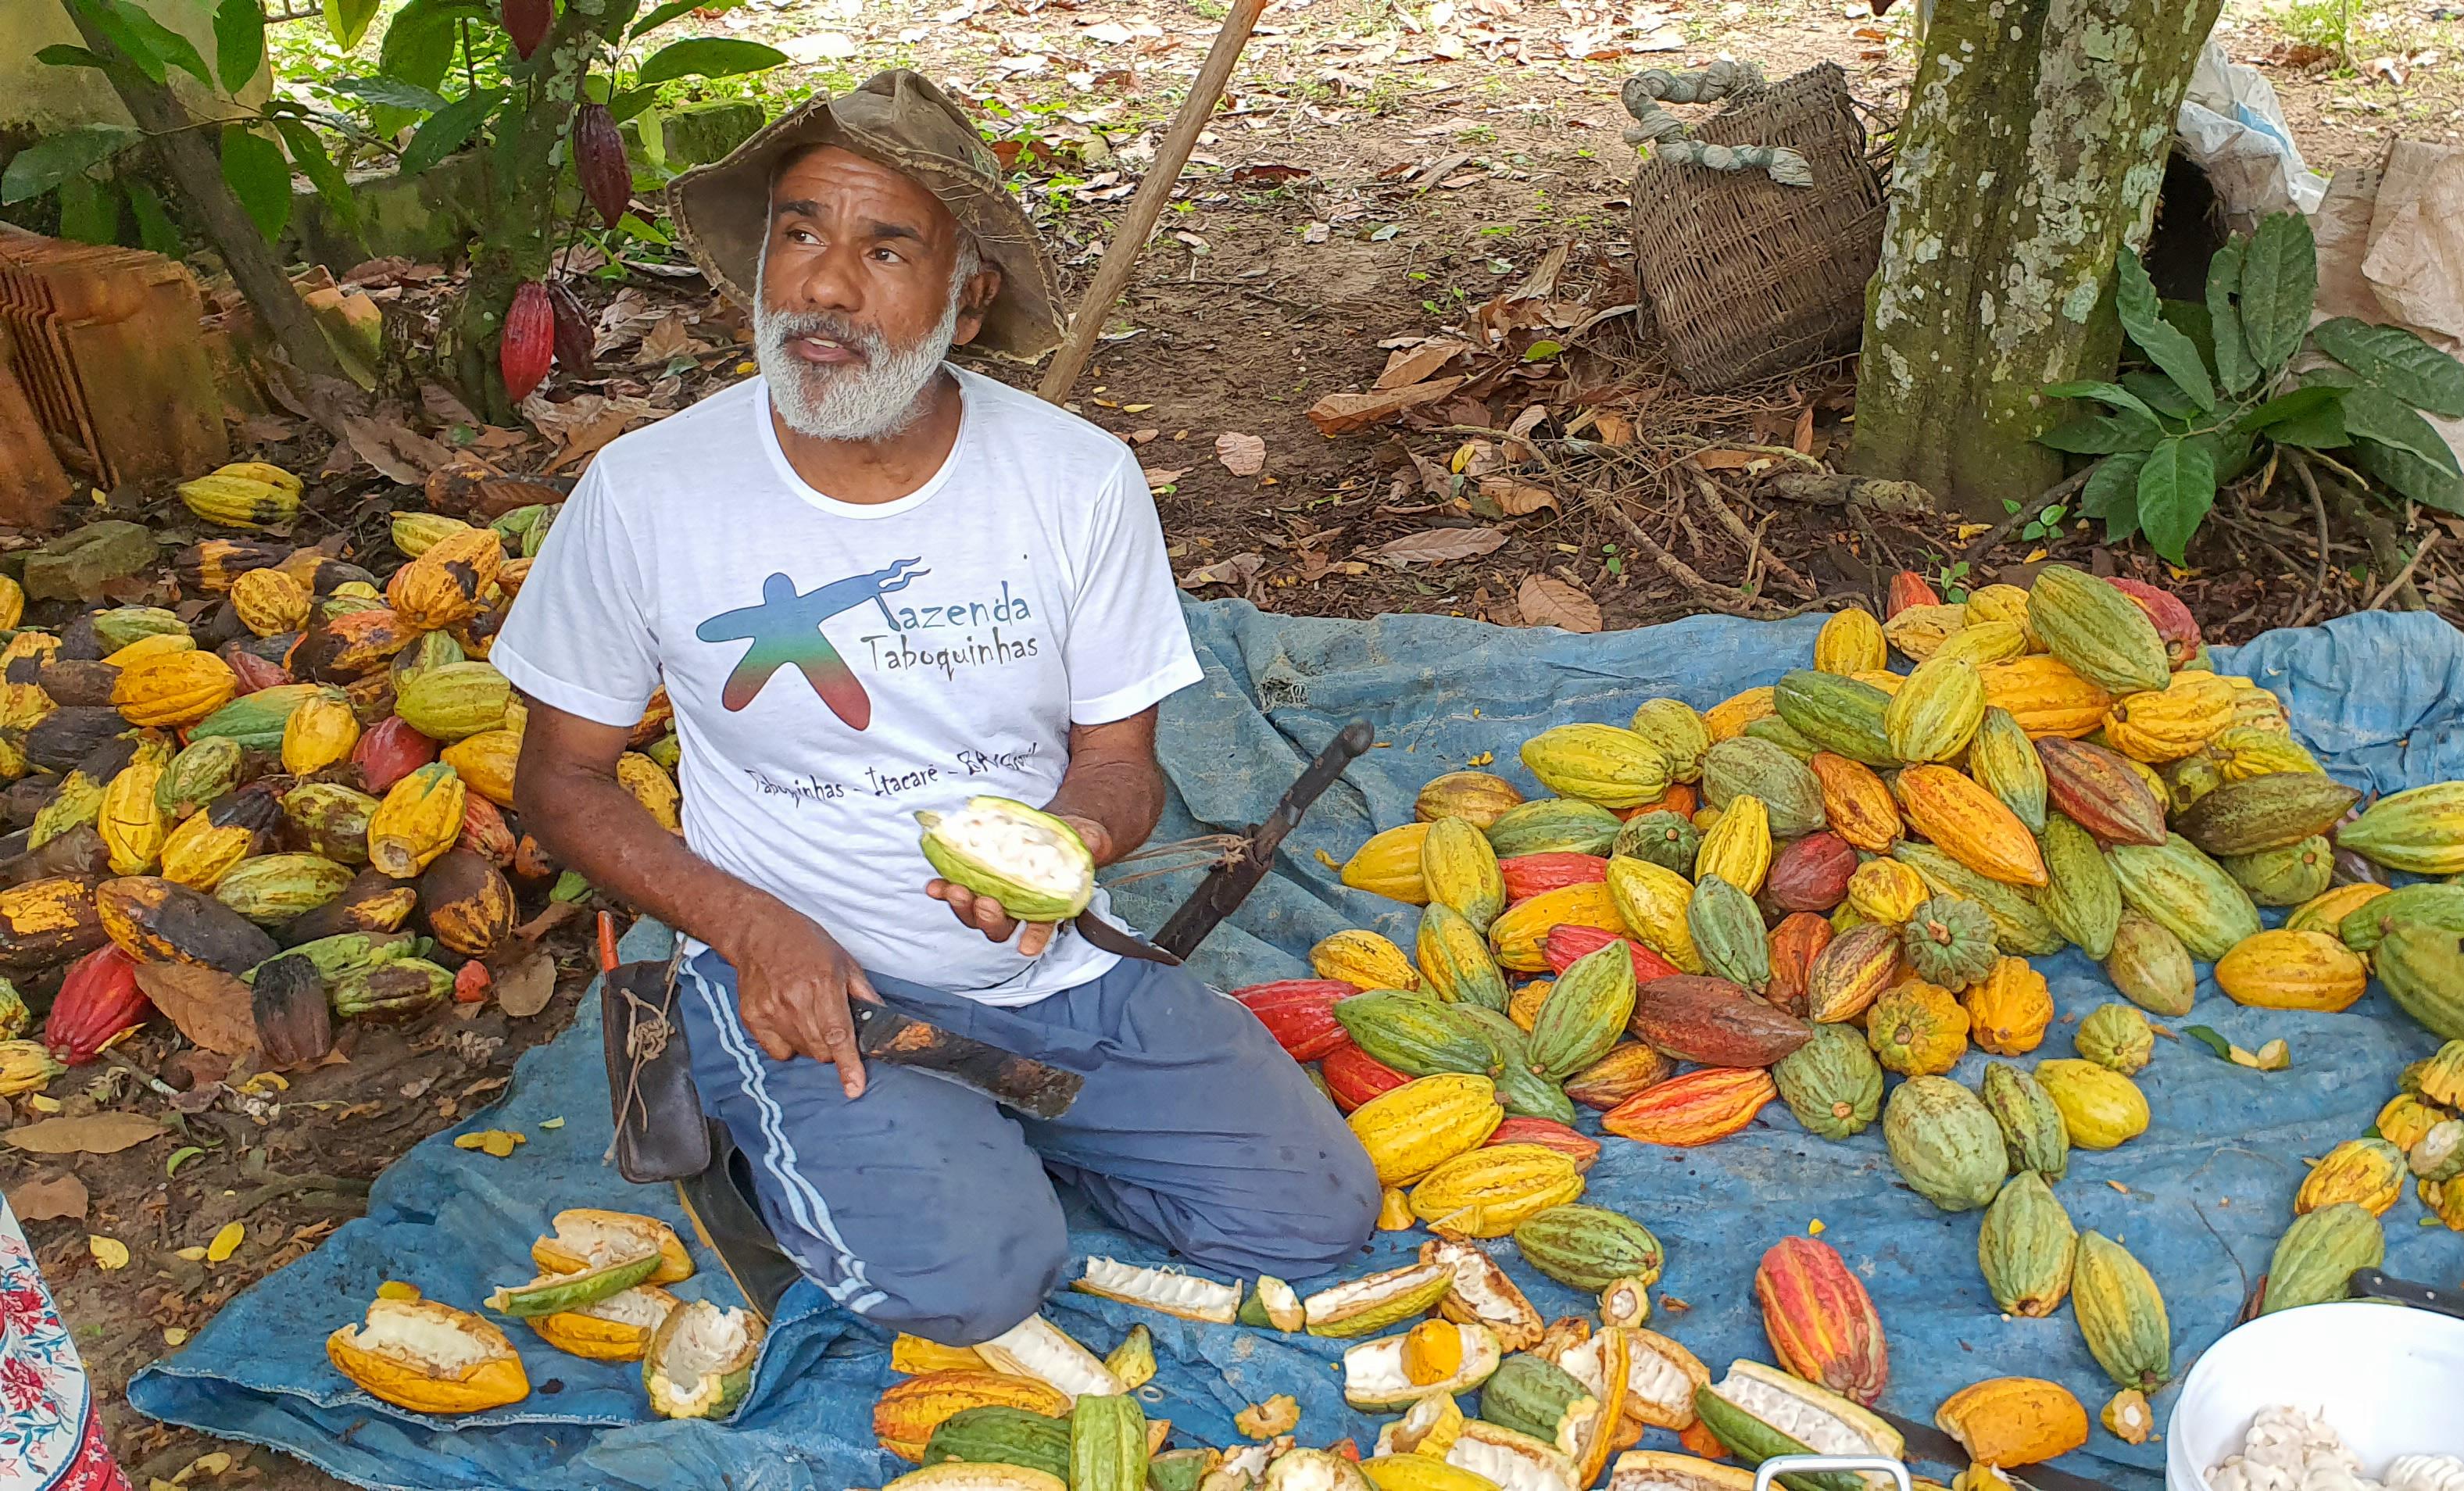 Osvaldo on his organic cacao farm Taboquinhas in Bahia Brazil surrounded by the Atlantic Rainforest